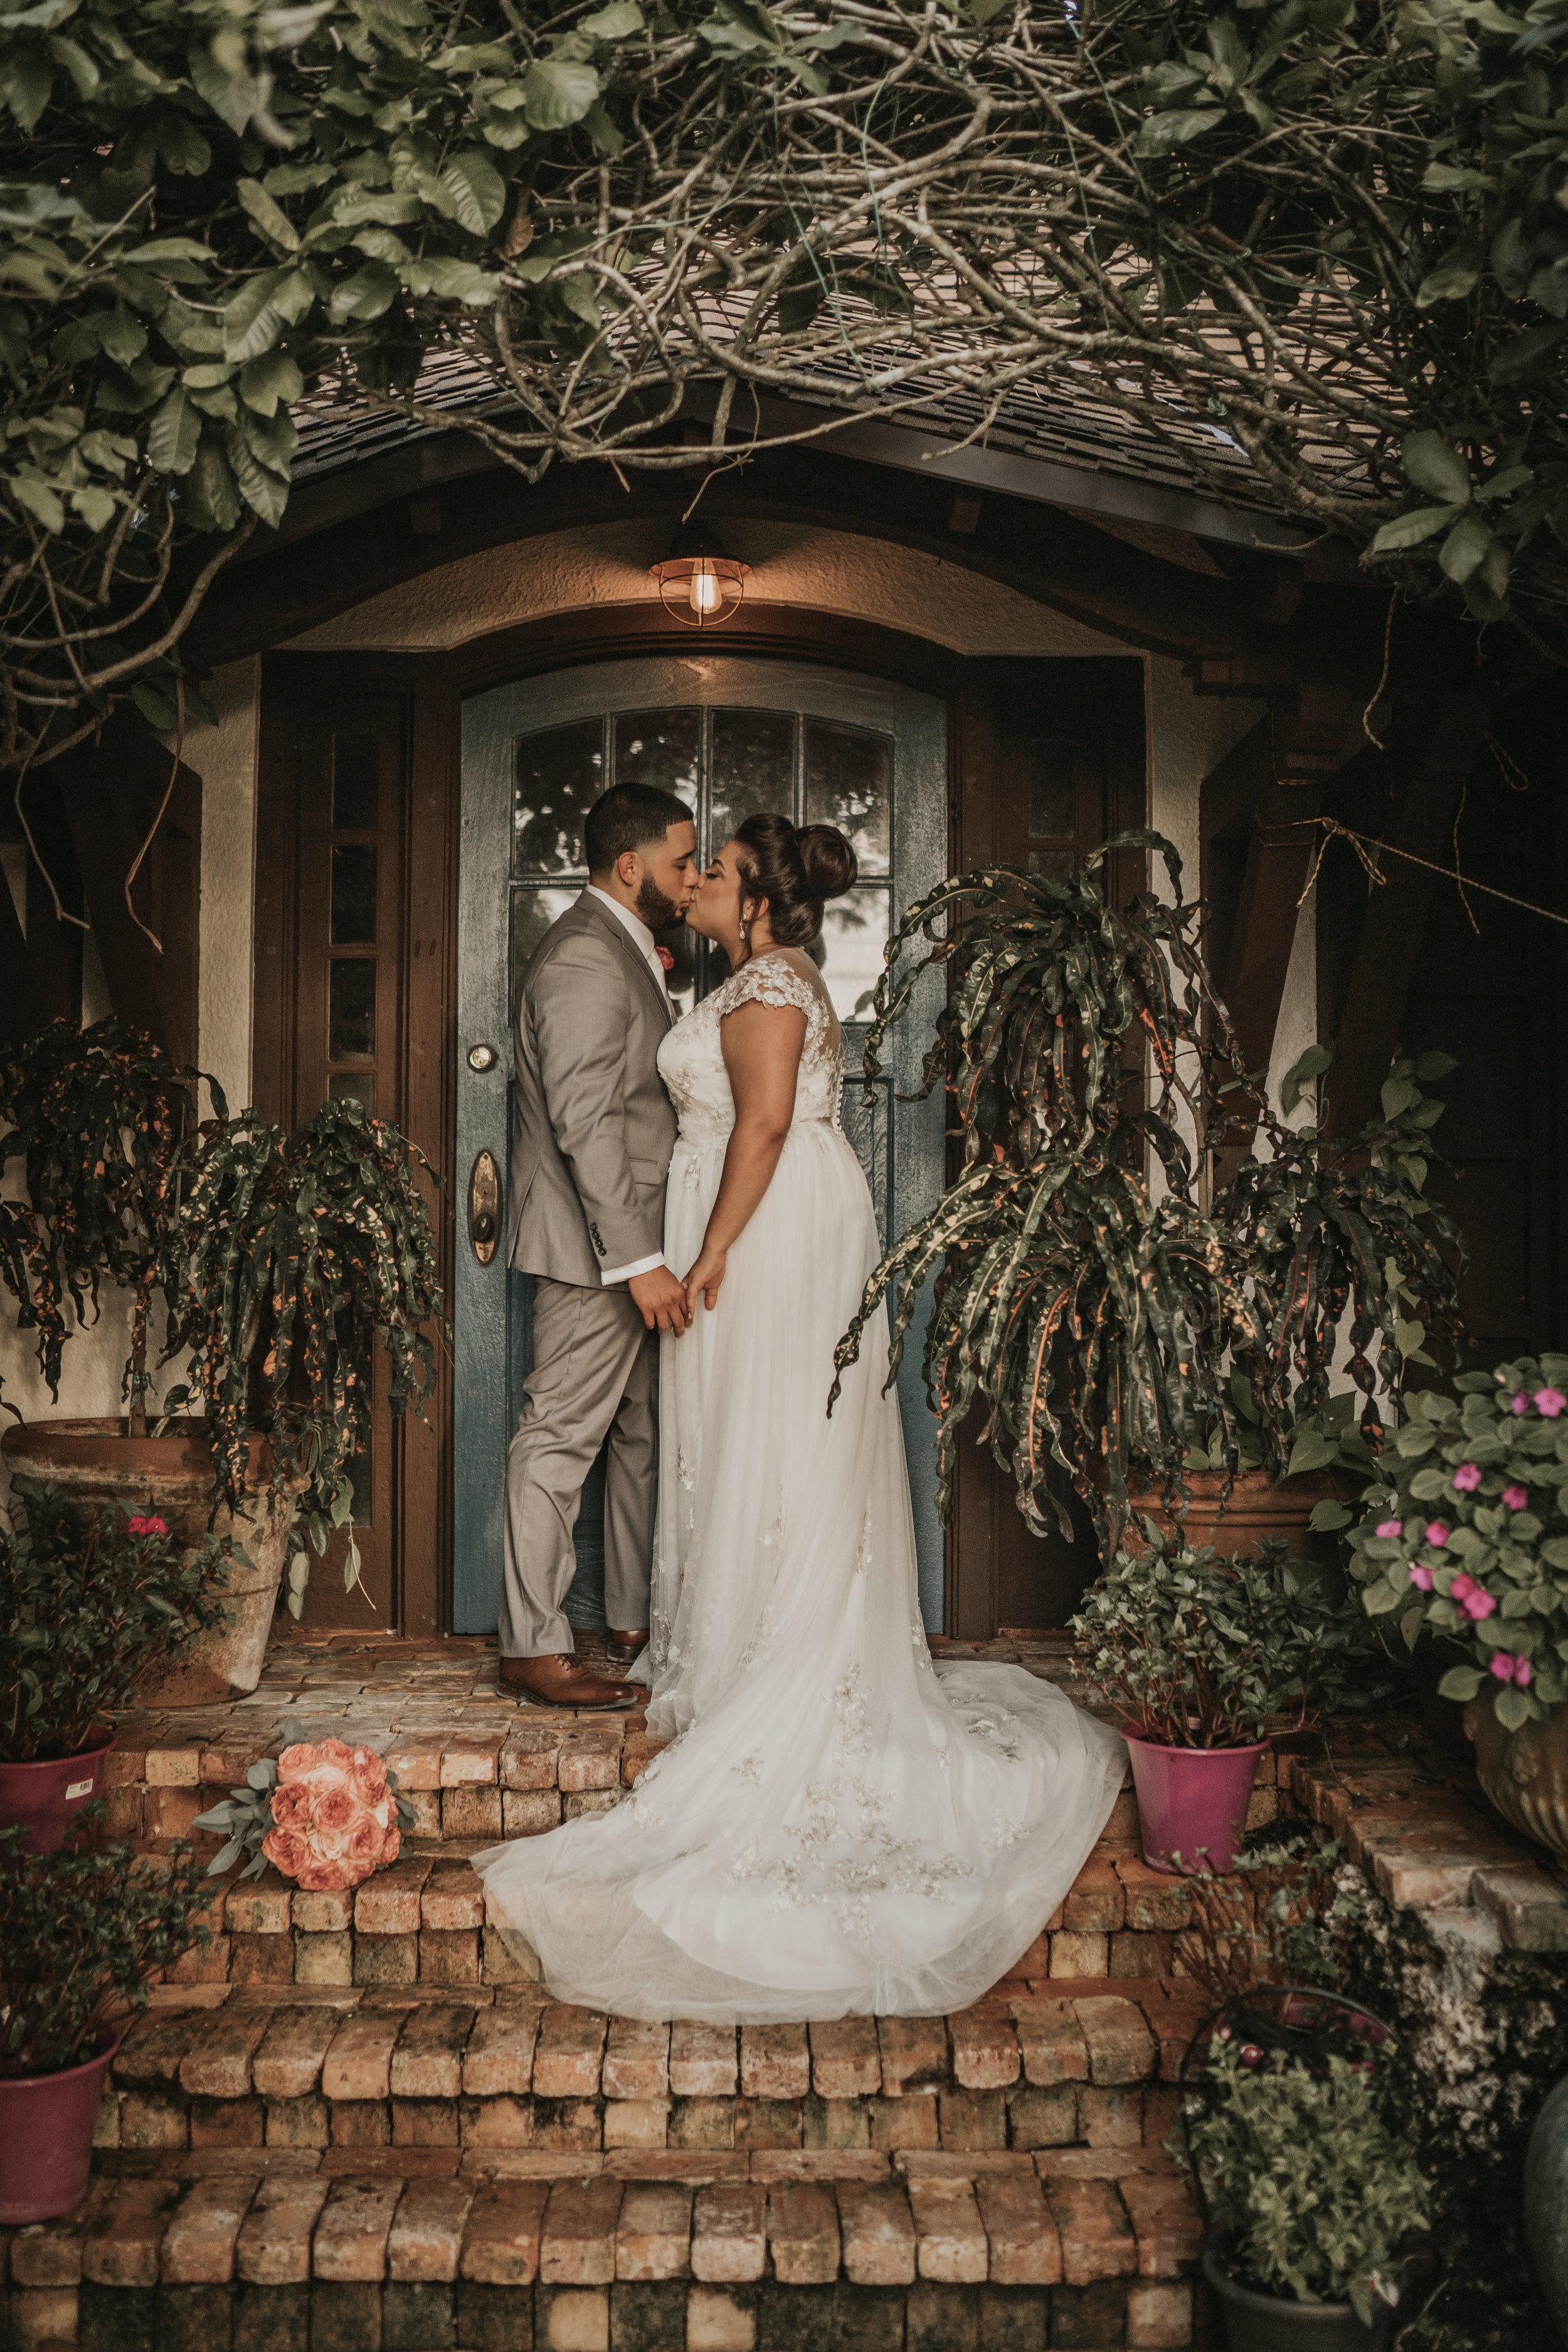 342MICHI&GABEWEDDINGDAY(WeddingFinal).jpg